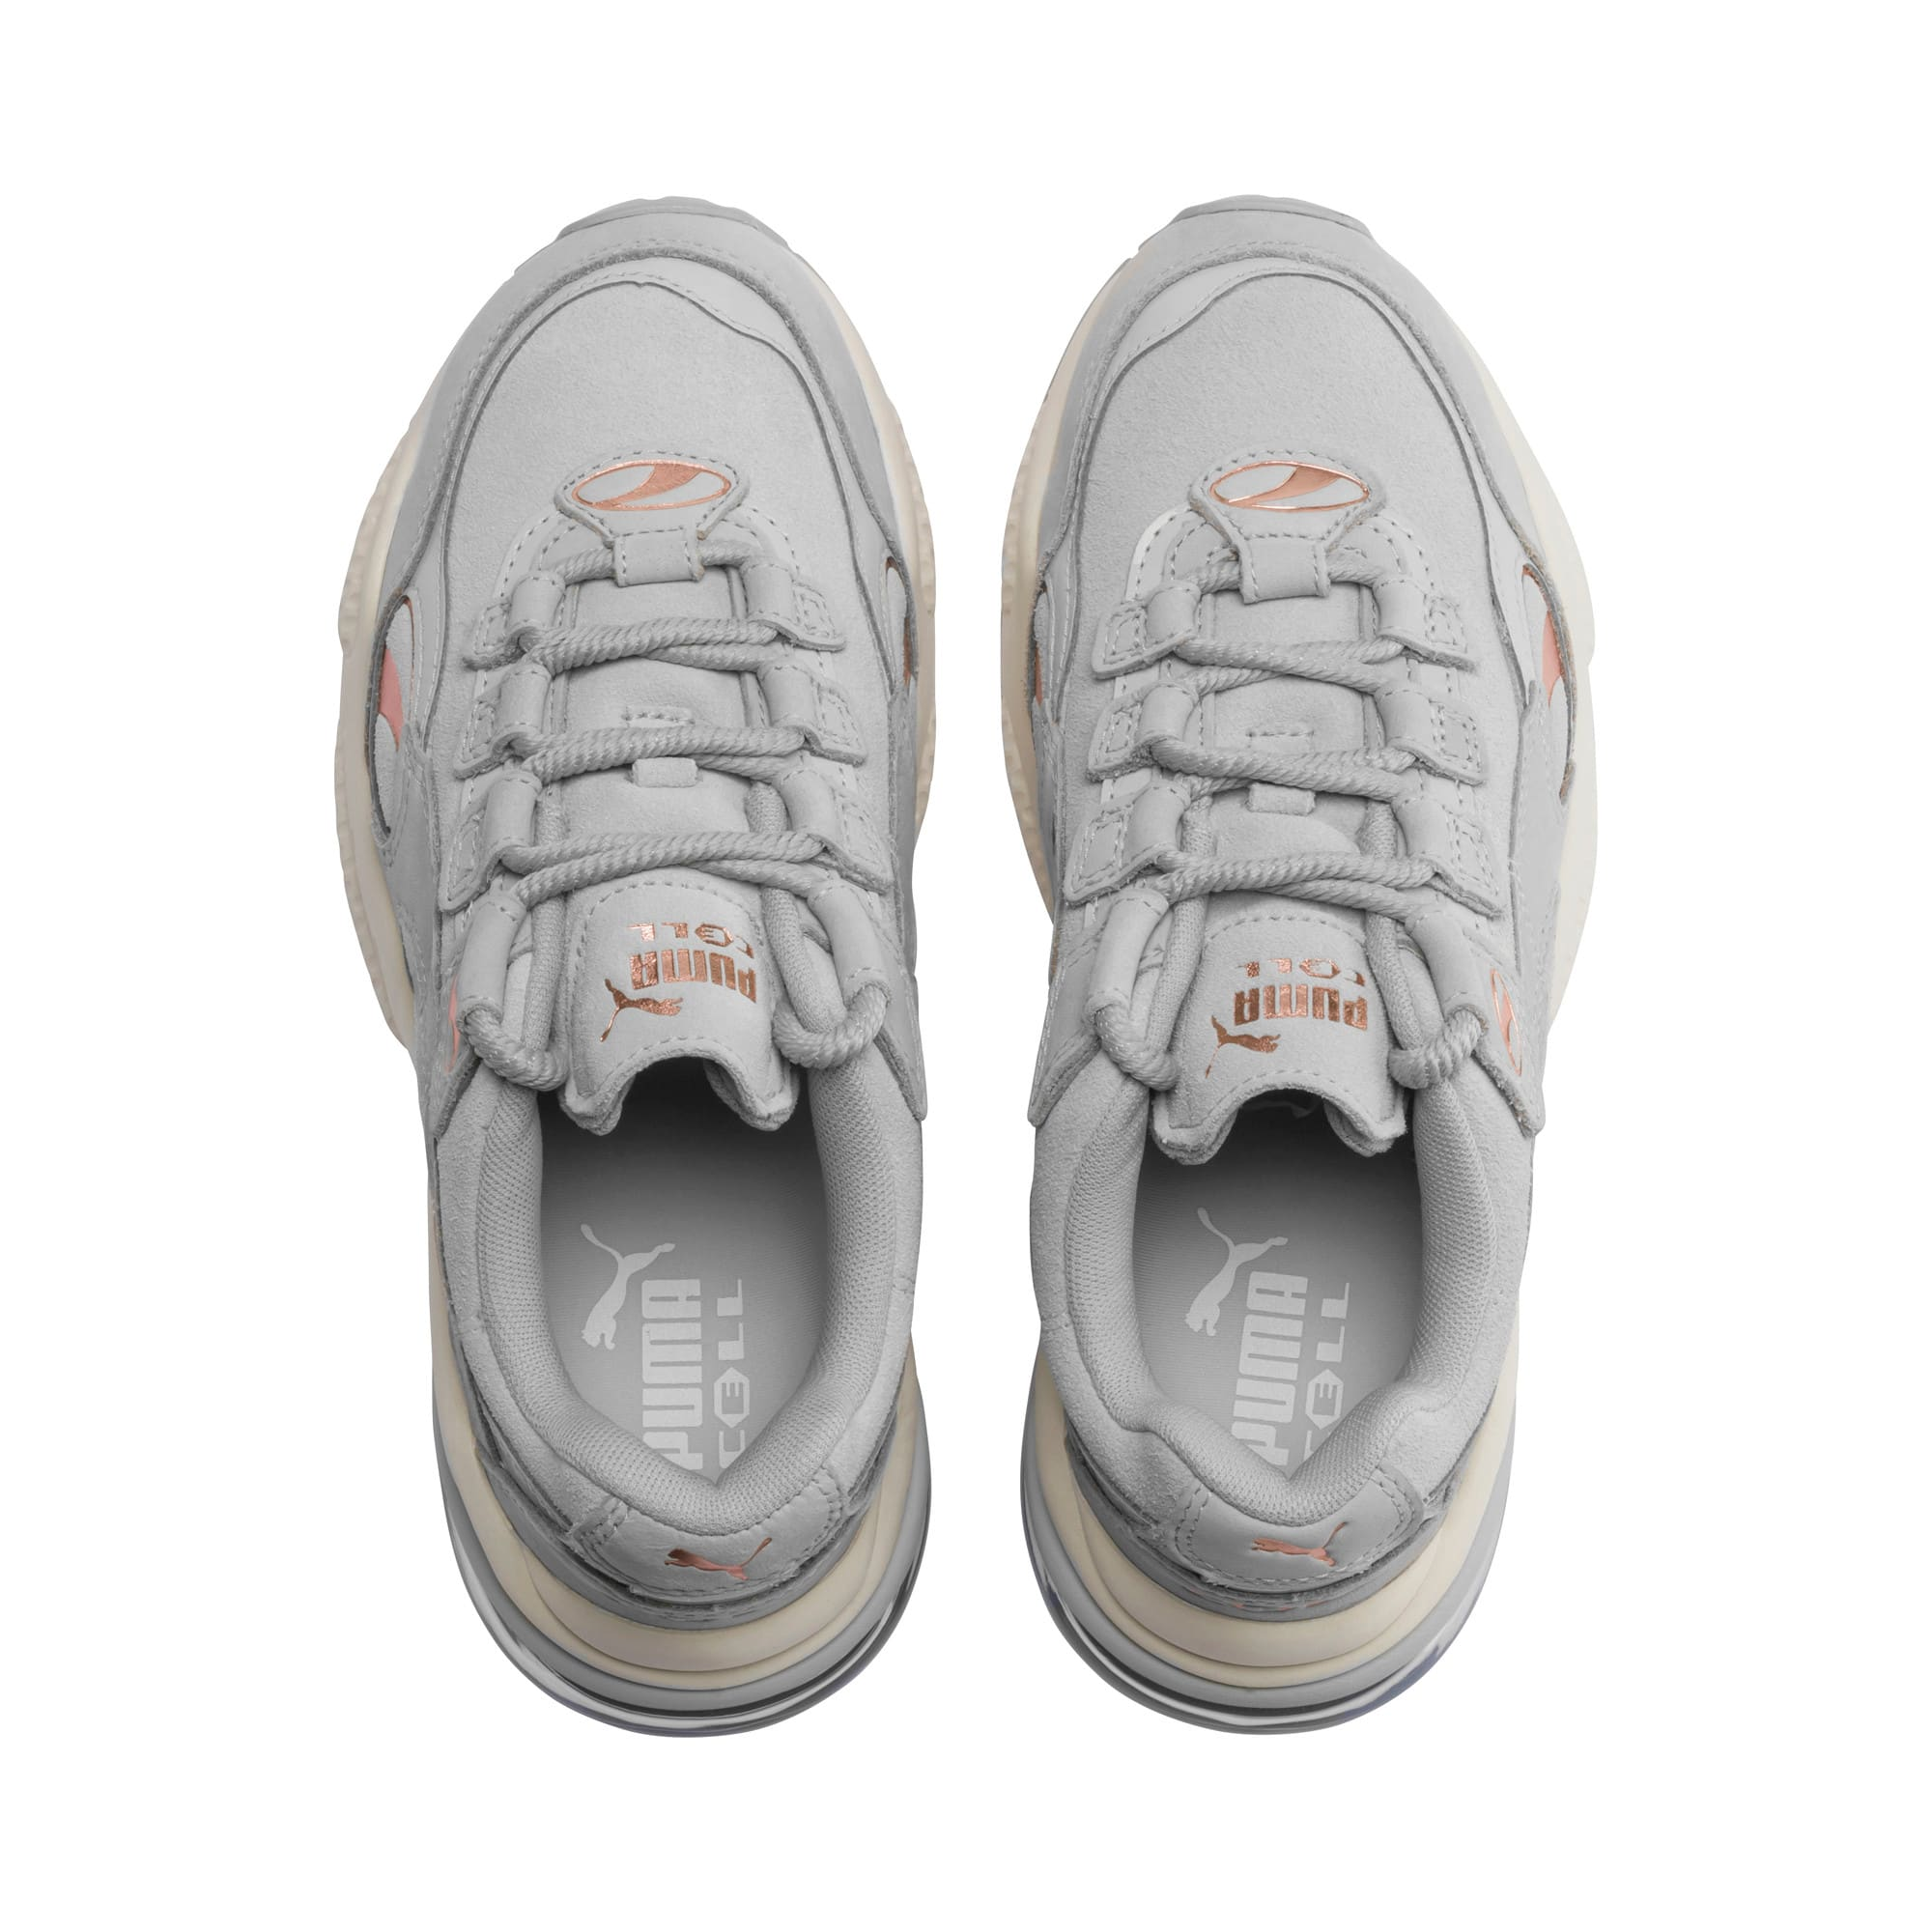 Thumbnail 6 of CELL Venom Patent Women's Sneakers, Gray Violet-Marshmallow, medium